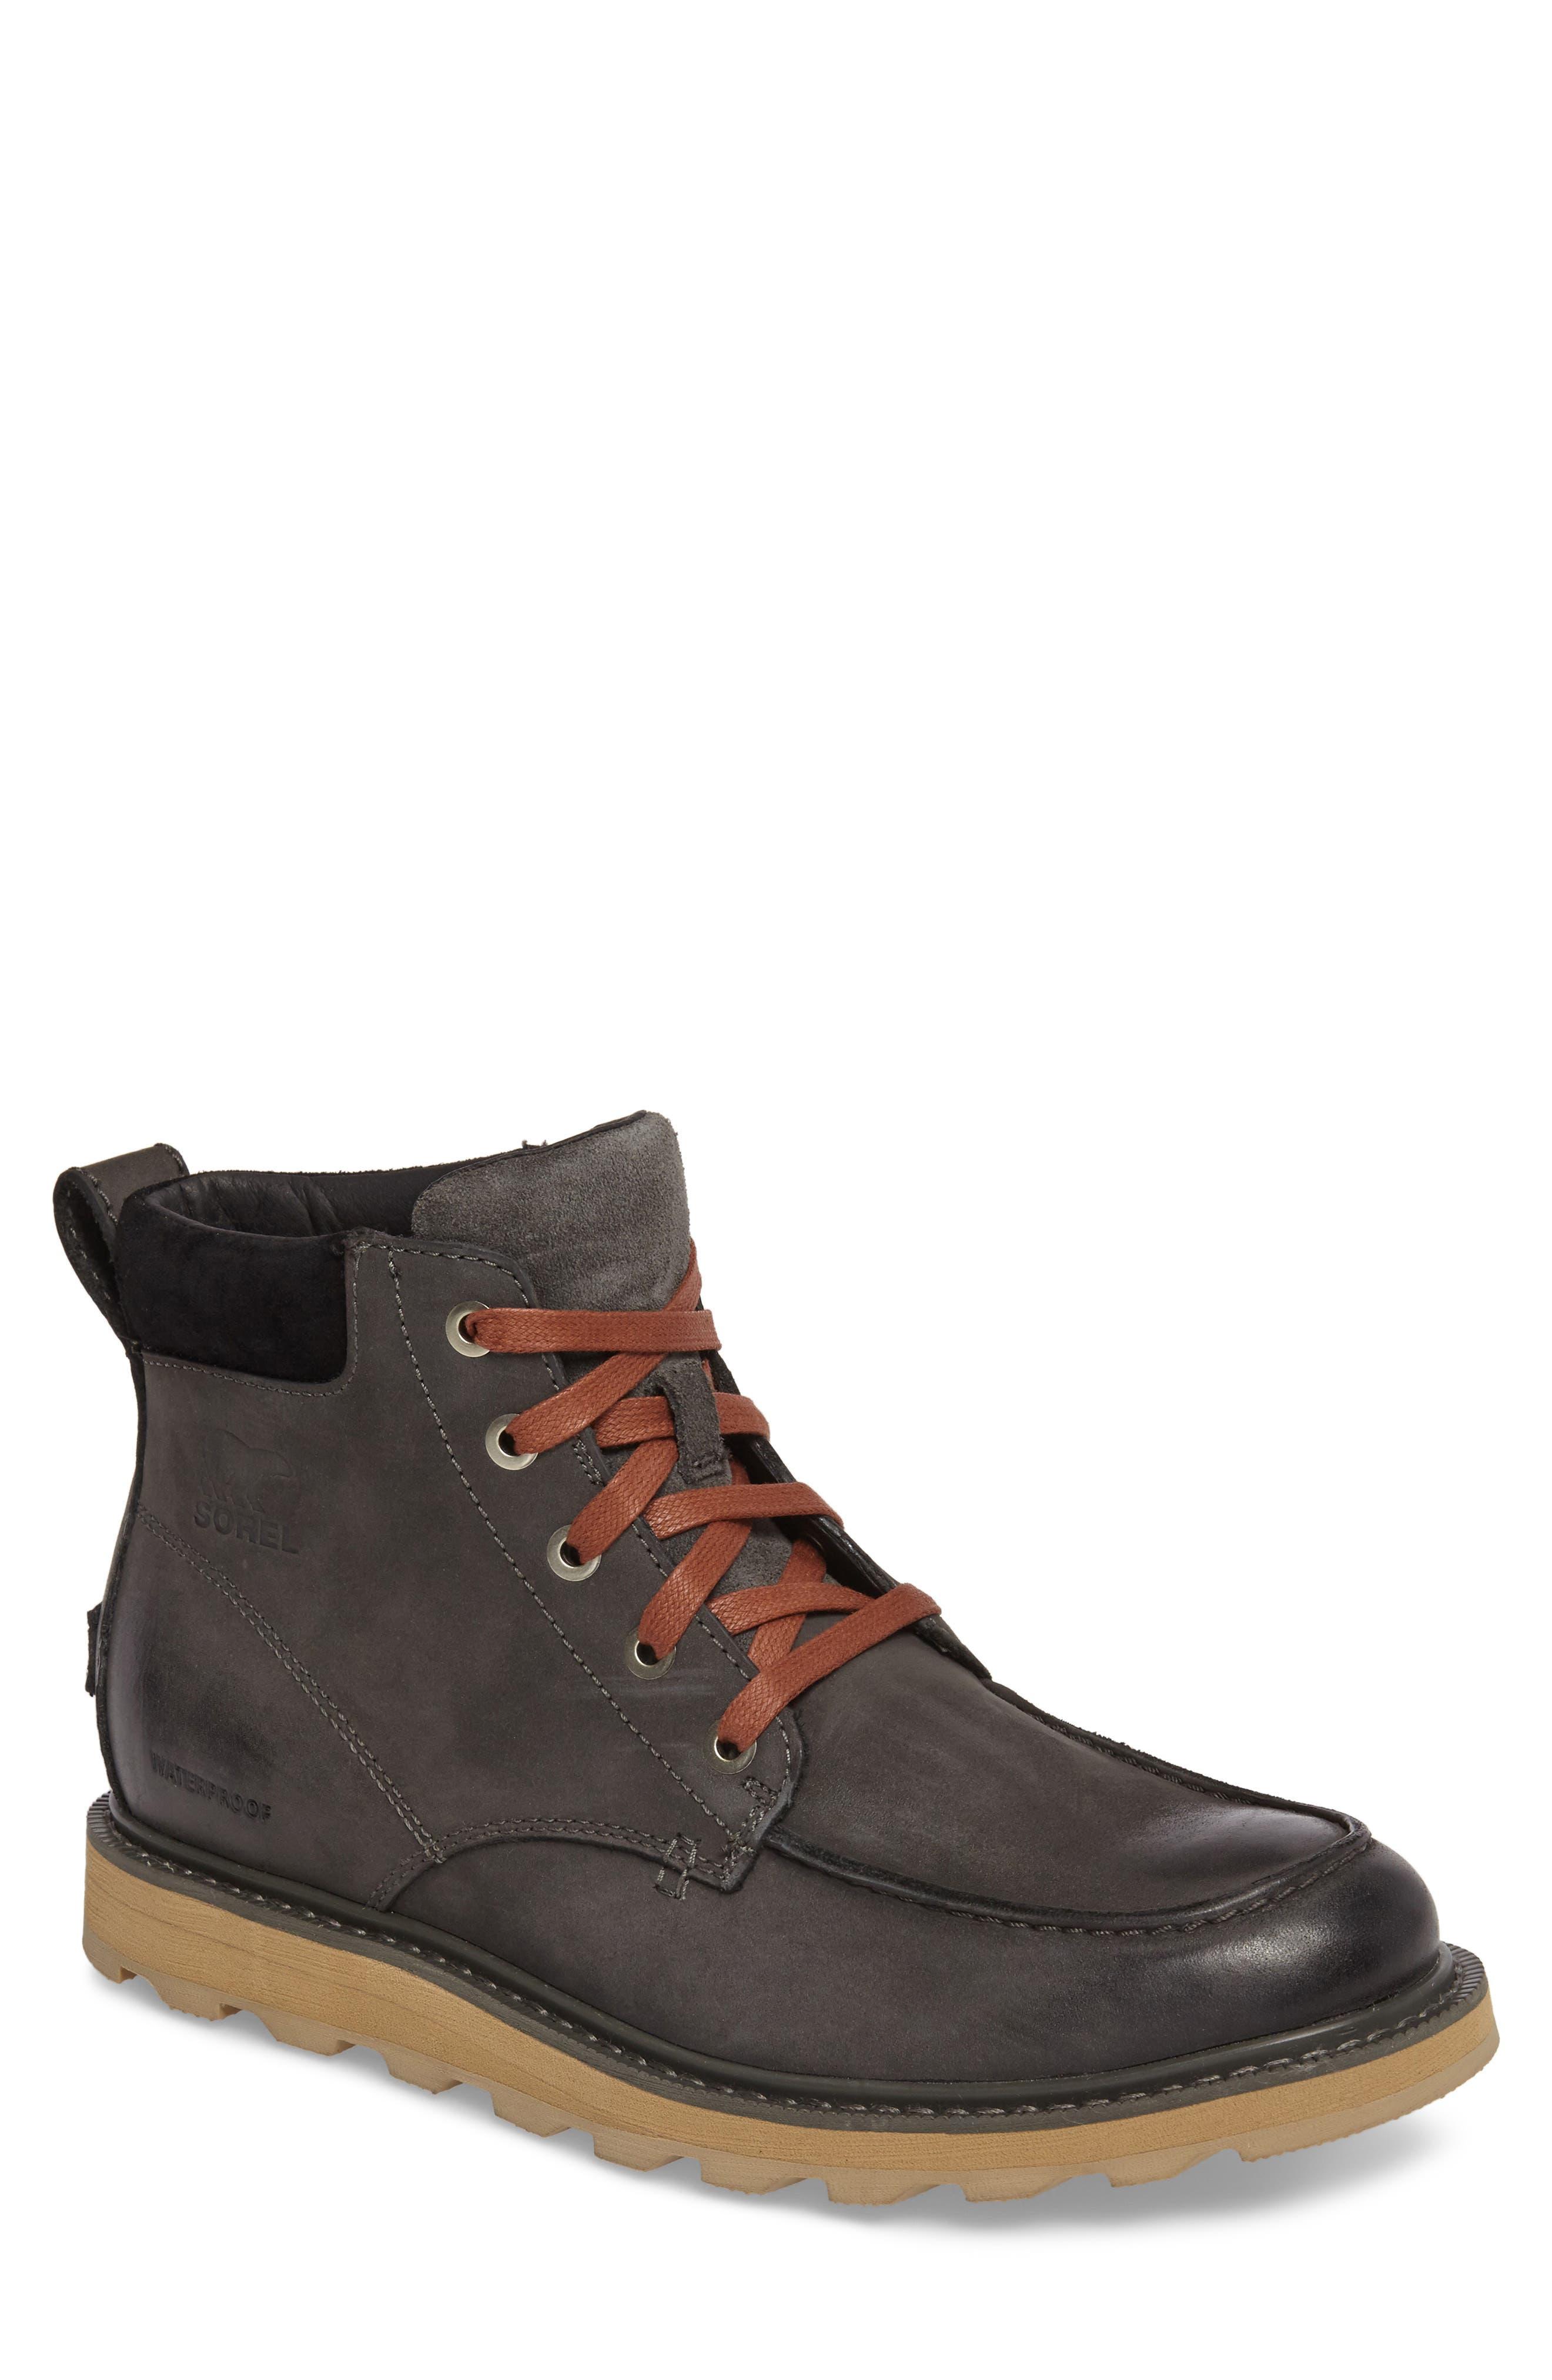 Sorel Madson Moc Toe Boot, Grey